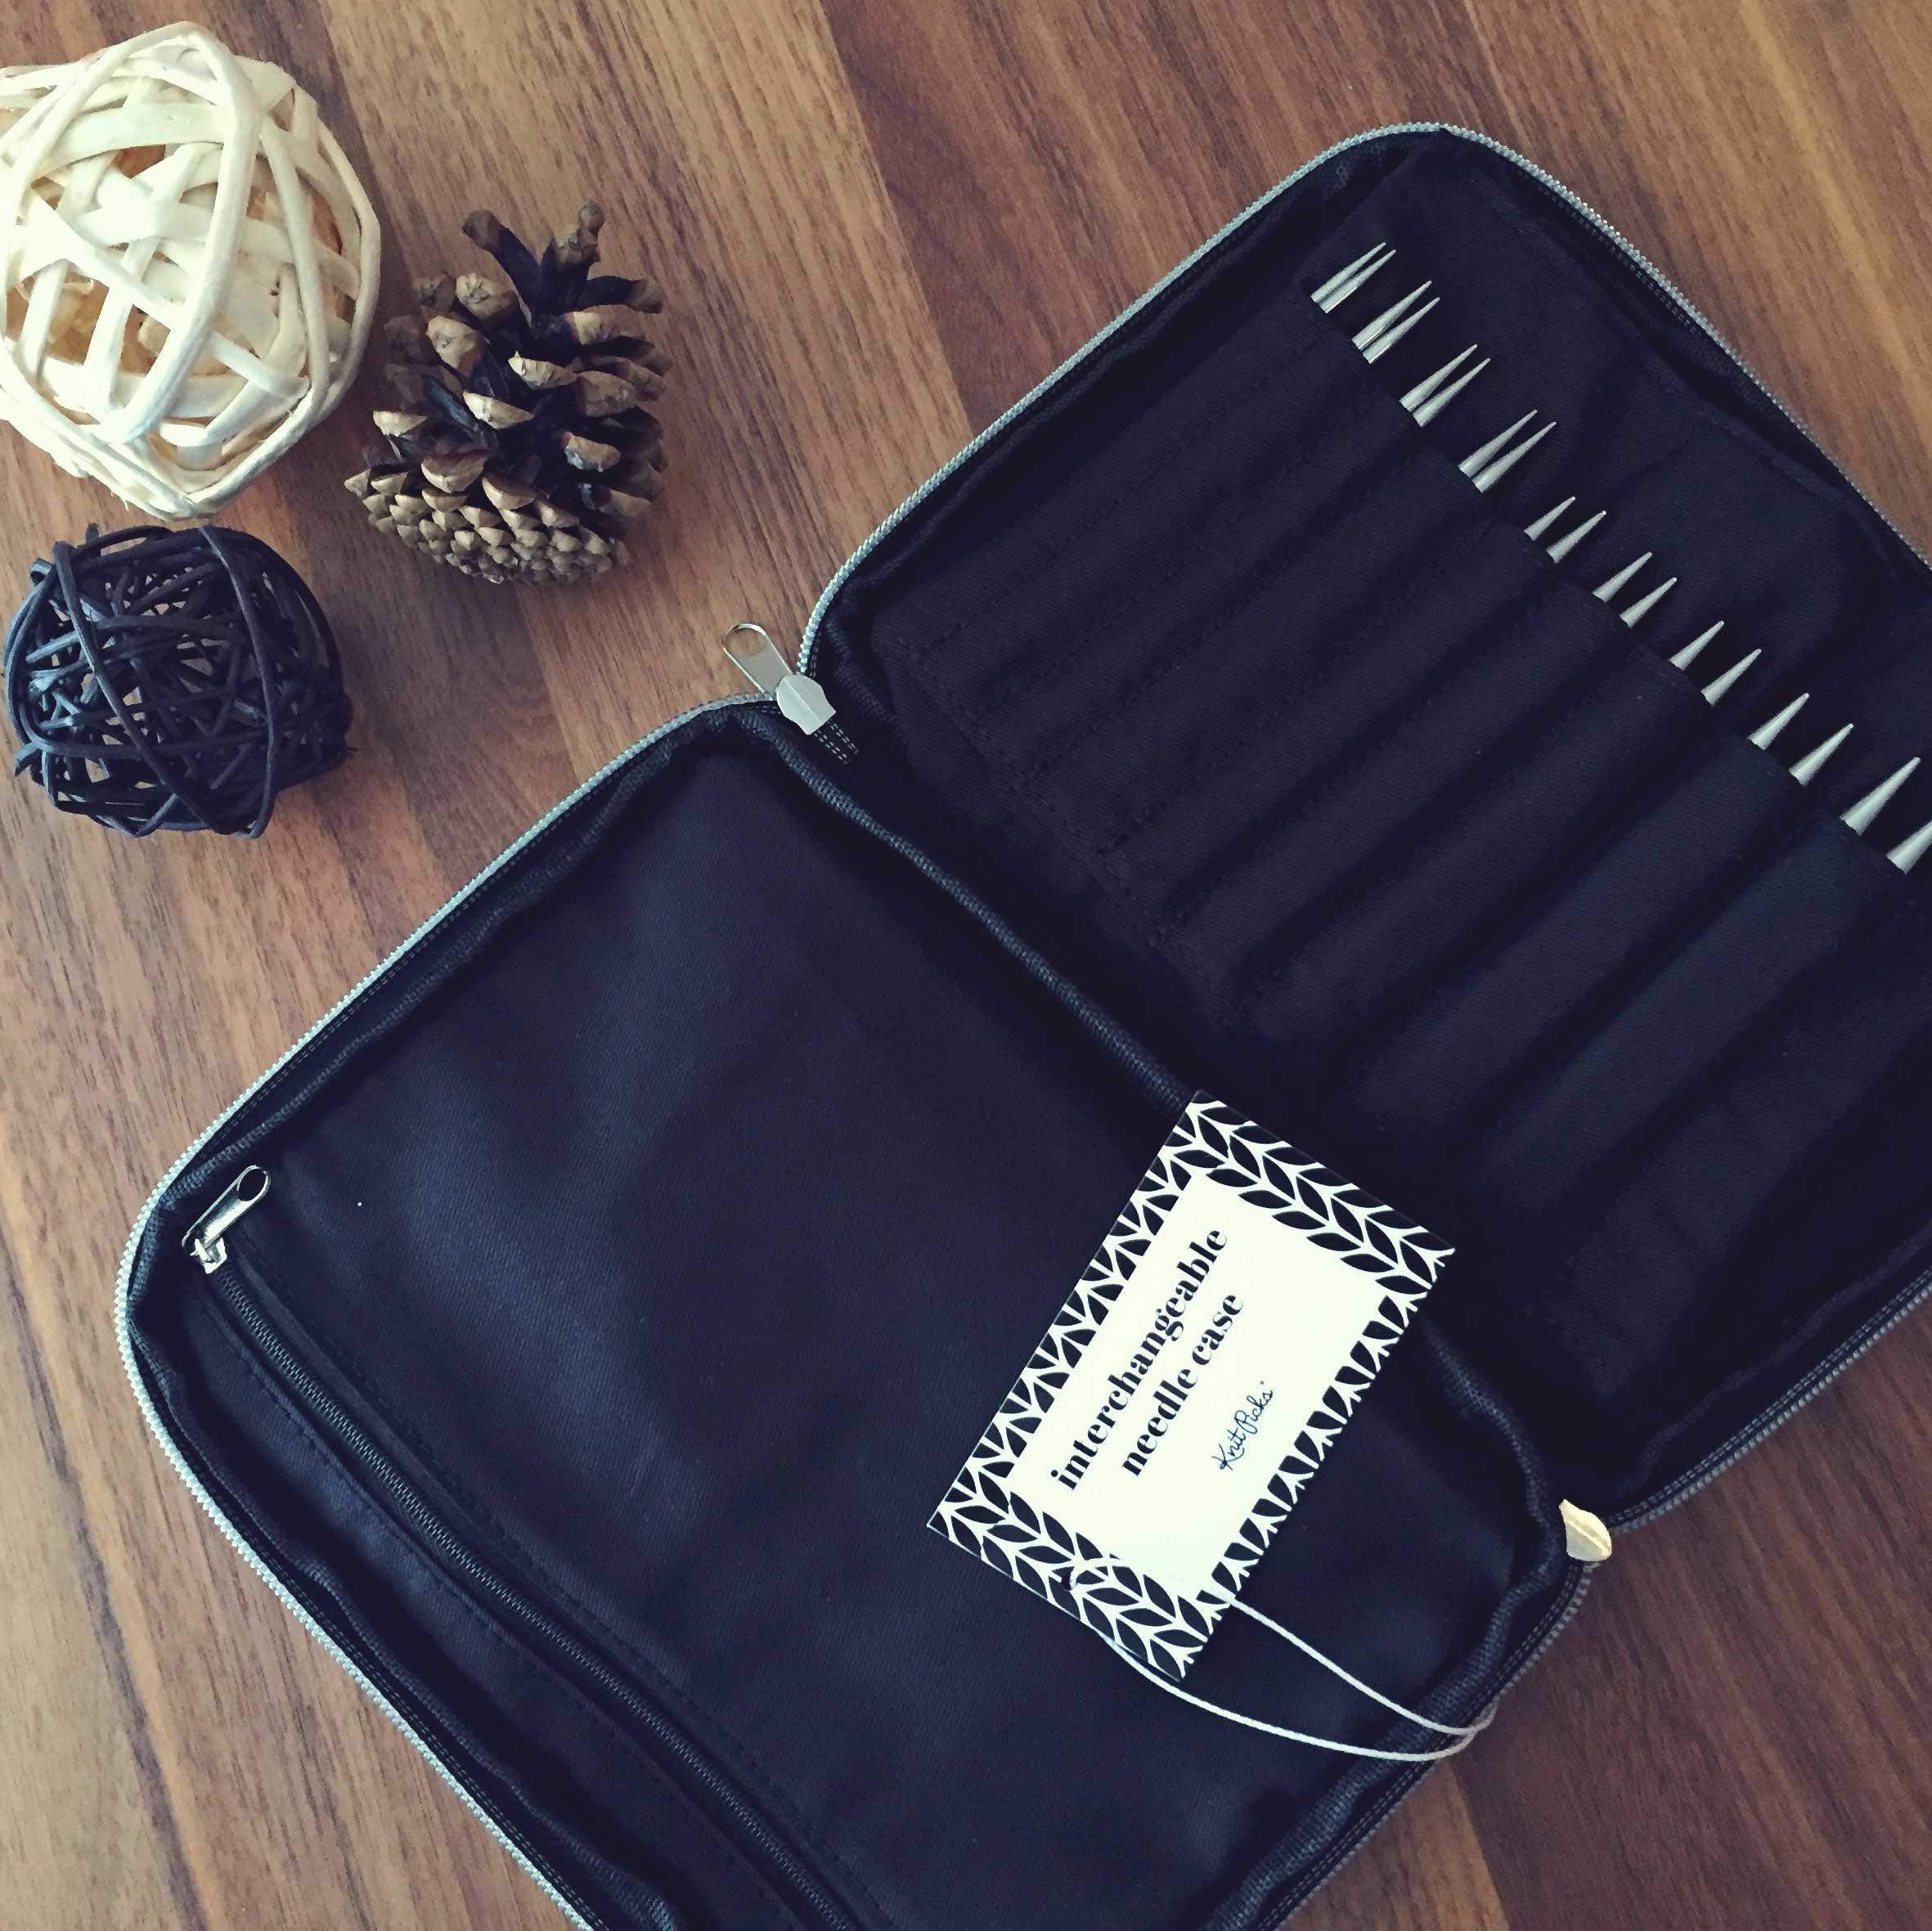 Knit Picks Interchangeable Needle Case on VeryShannon.com